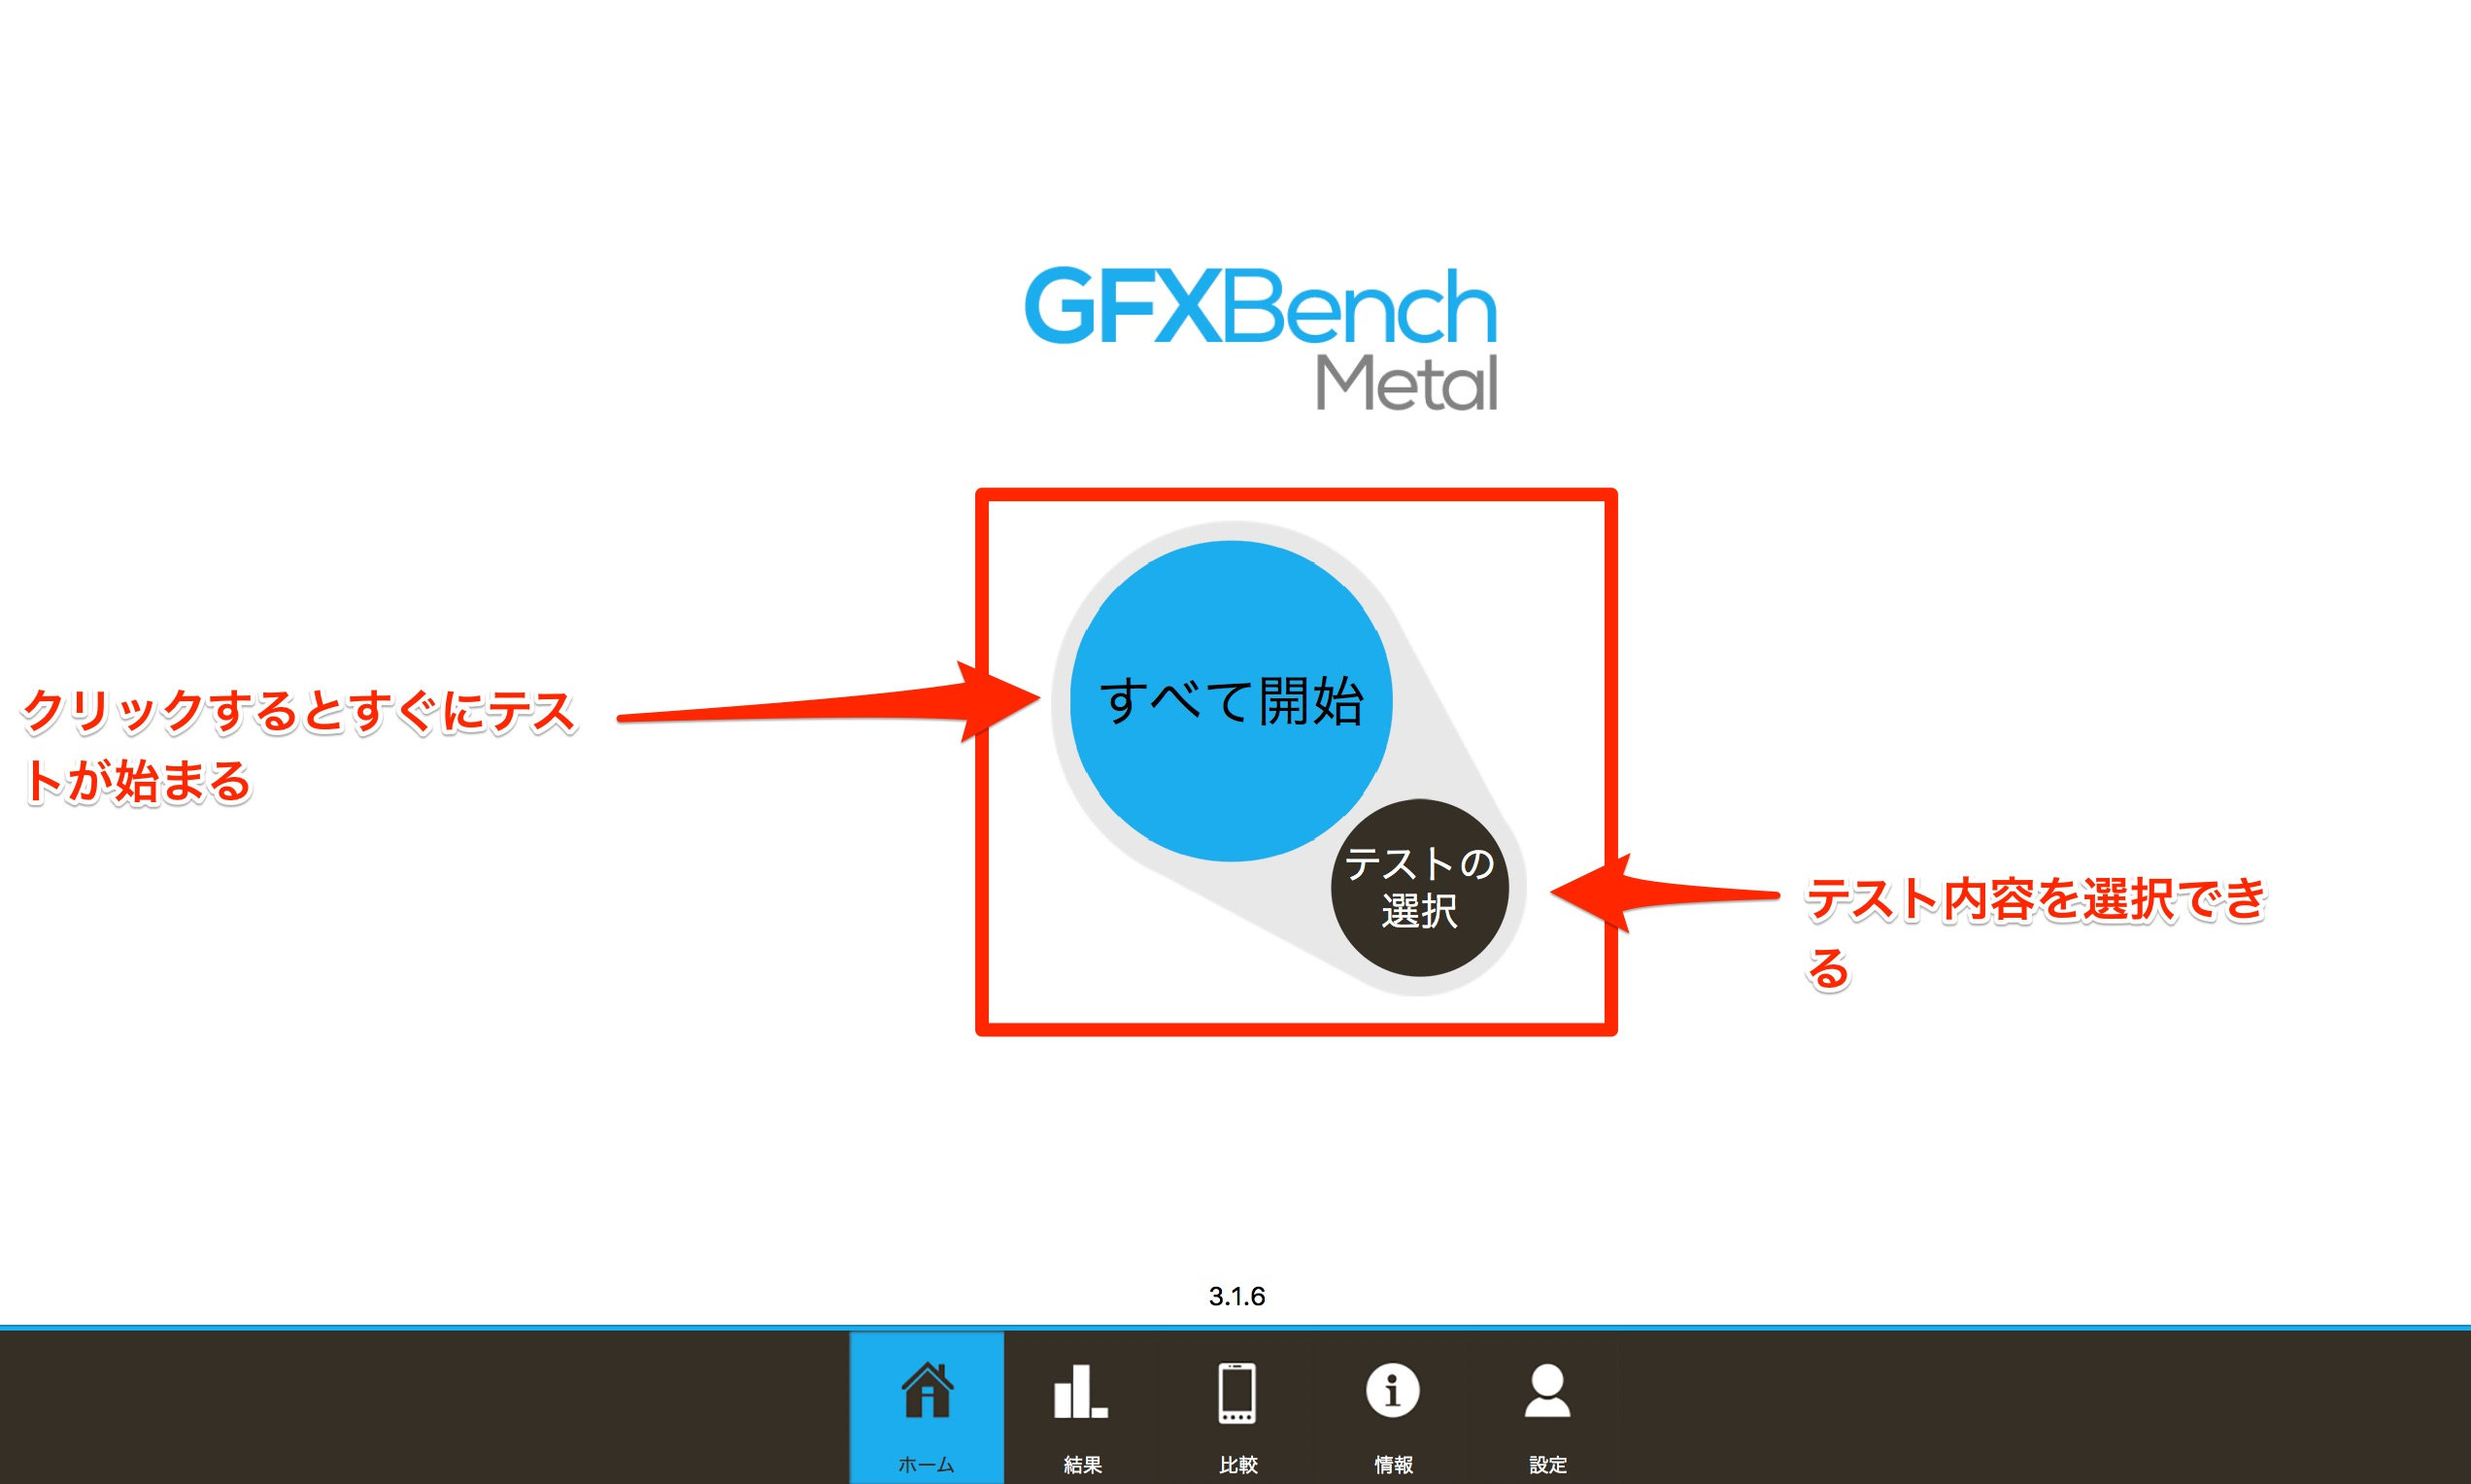 GFXBench Metal2 - iMac 4K Retina 21.5インチで様々なベンチマークテストを行なってみました